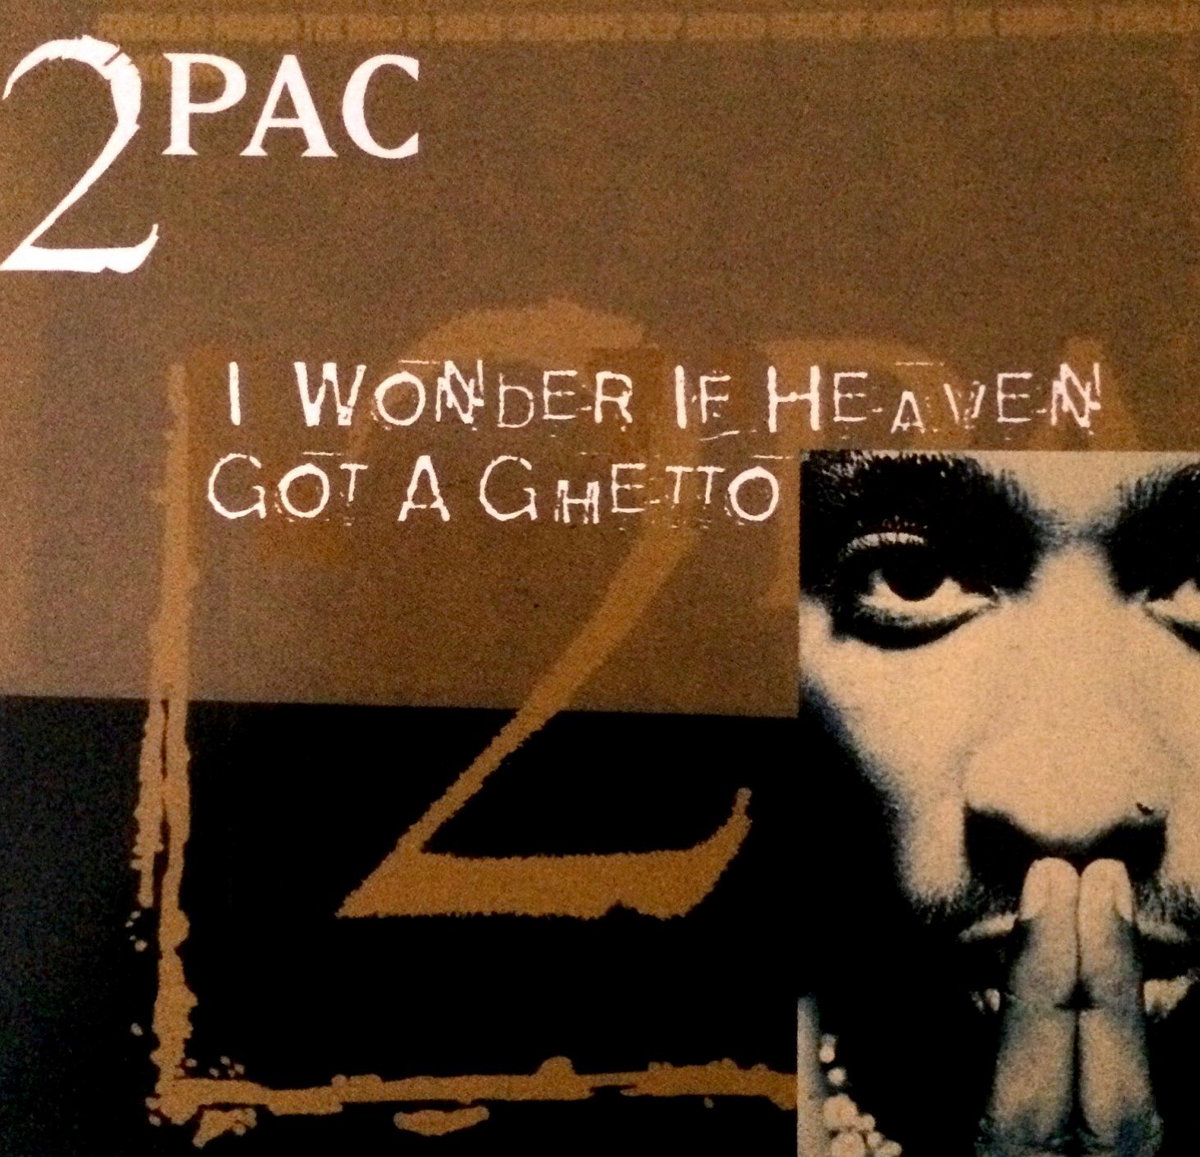 I Wonder If Heaven Got A Ghetto (Soulpower Hip Hop Radio Mix